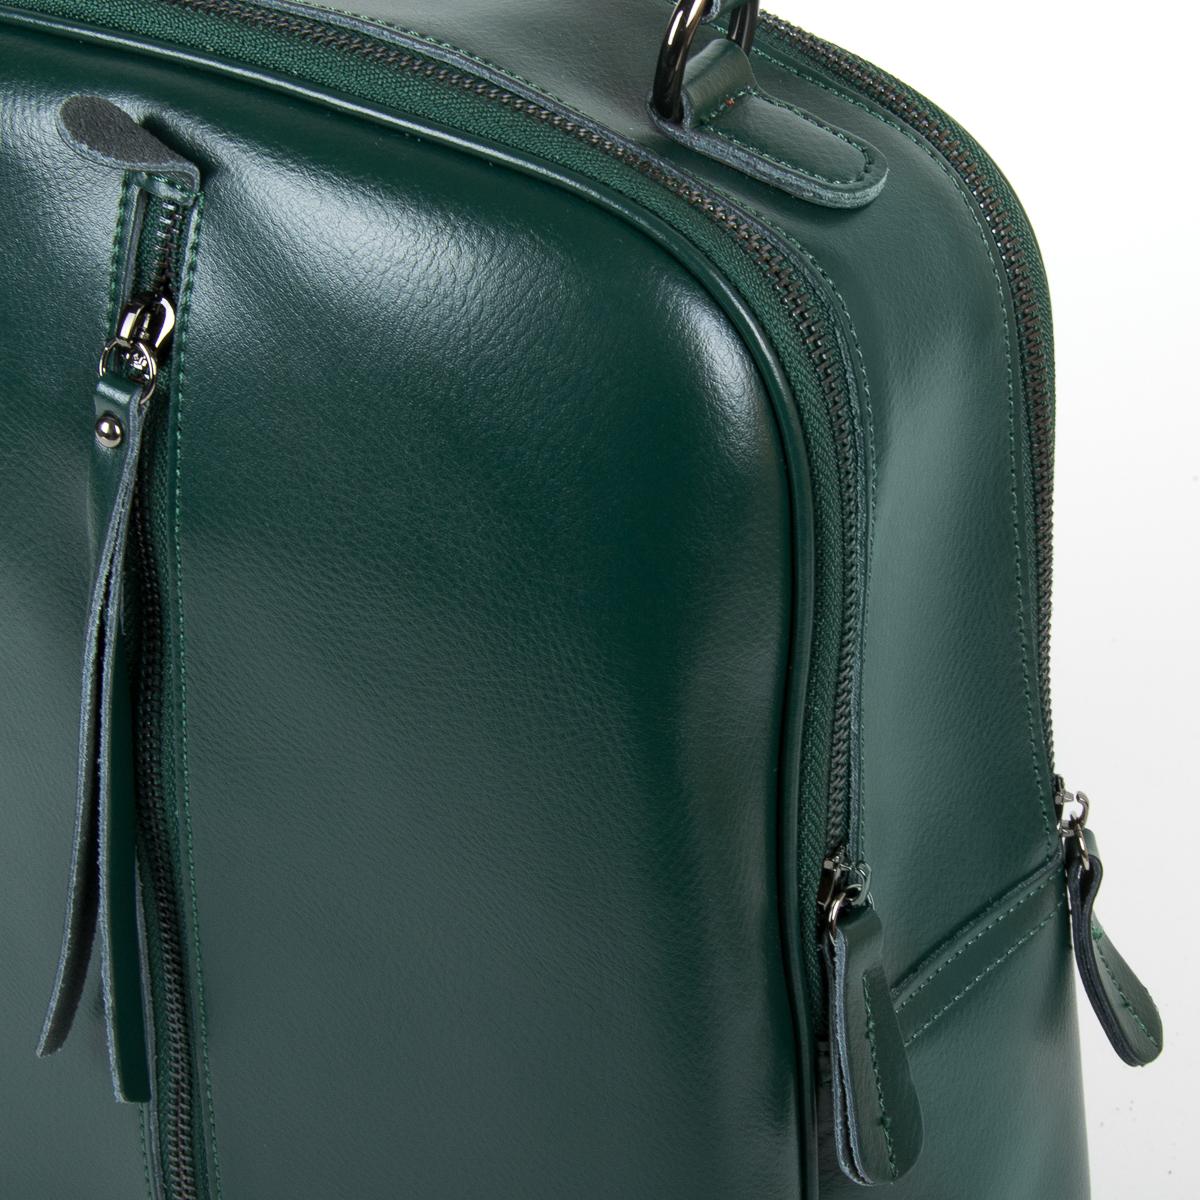 Сумка Женская Рюкзак кожа ALEX RAI 9-01 8694-3 green - фото 3